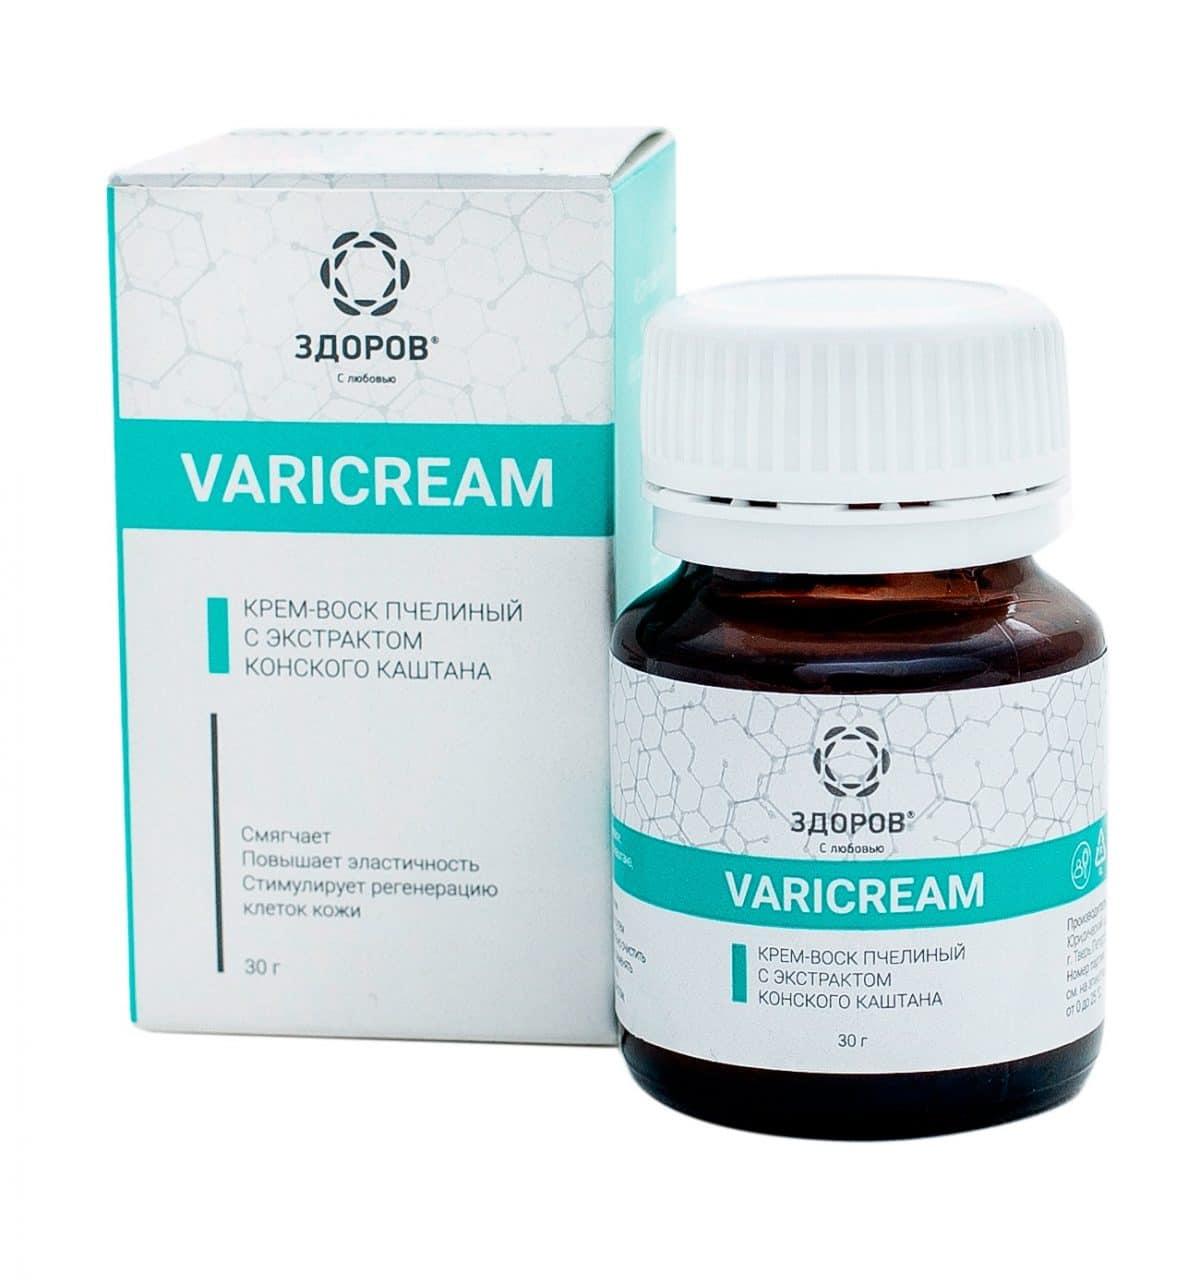 VariCream What is it? Indications